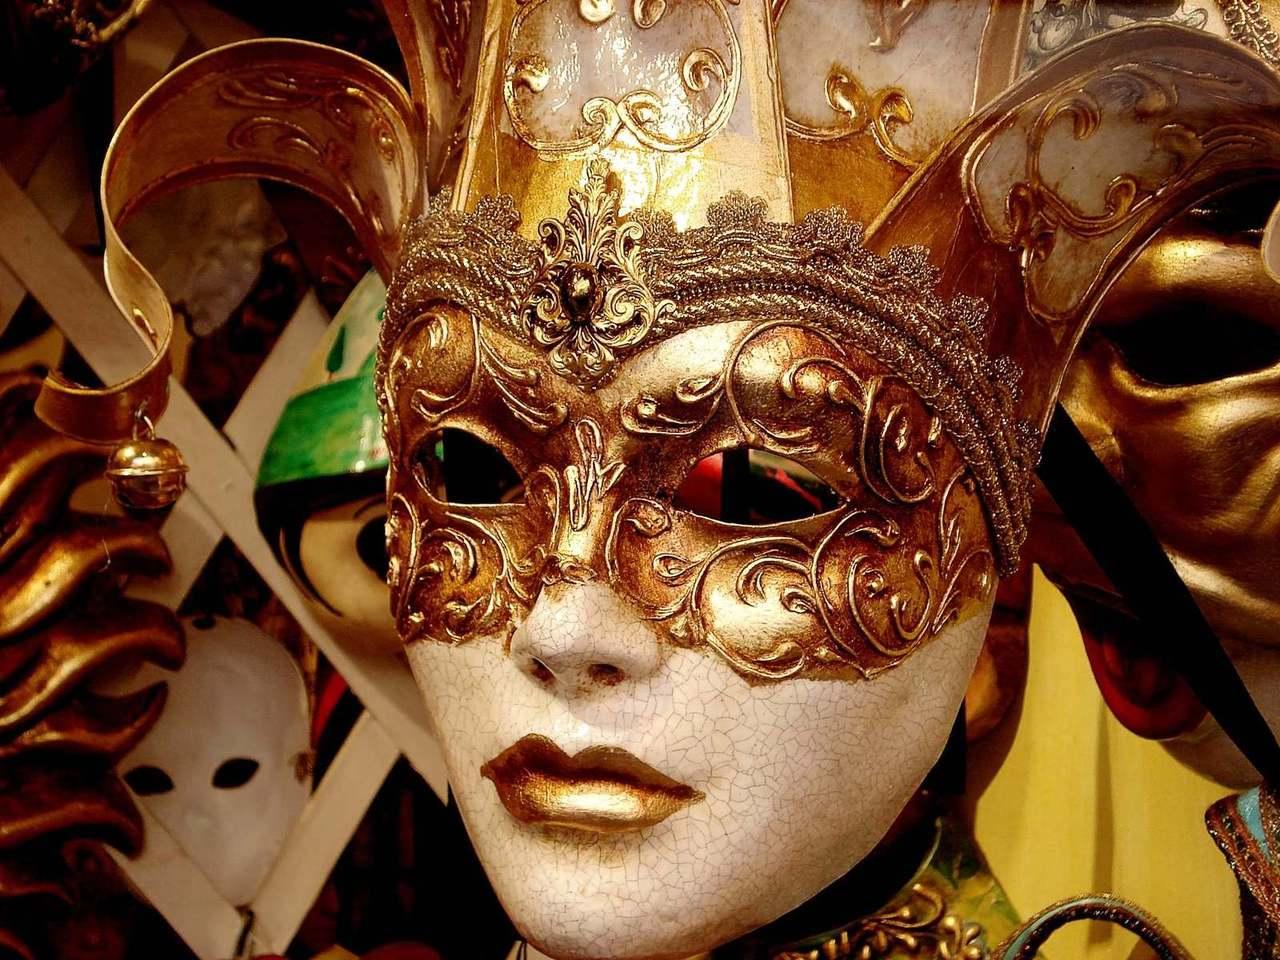 Carnaval 2020 en Cubillos del Sil 1